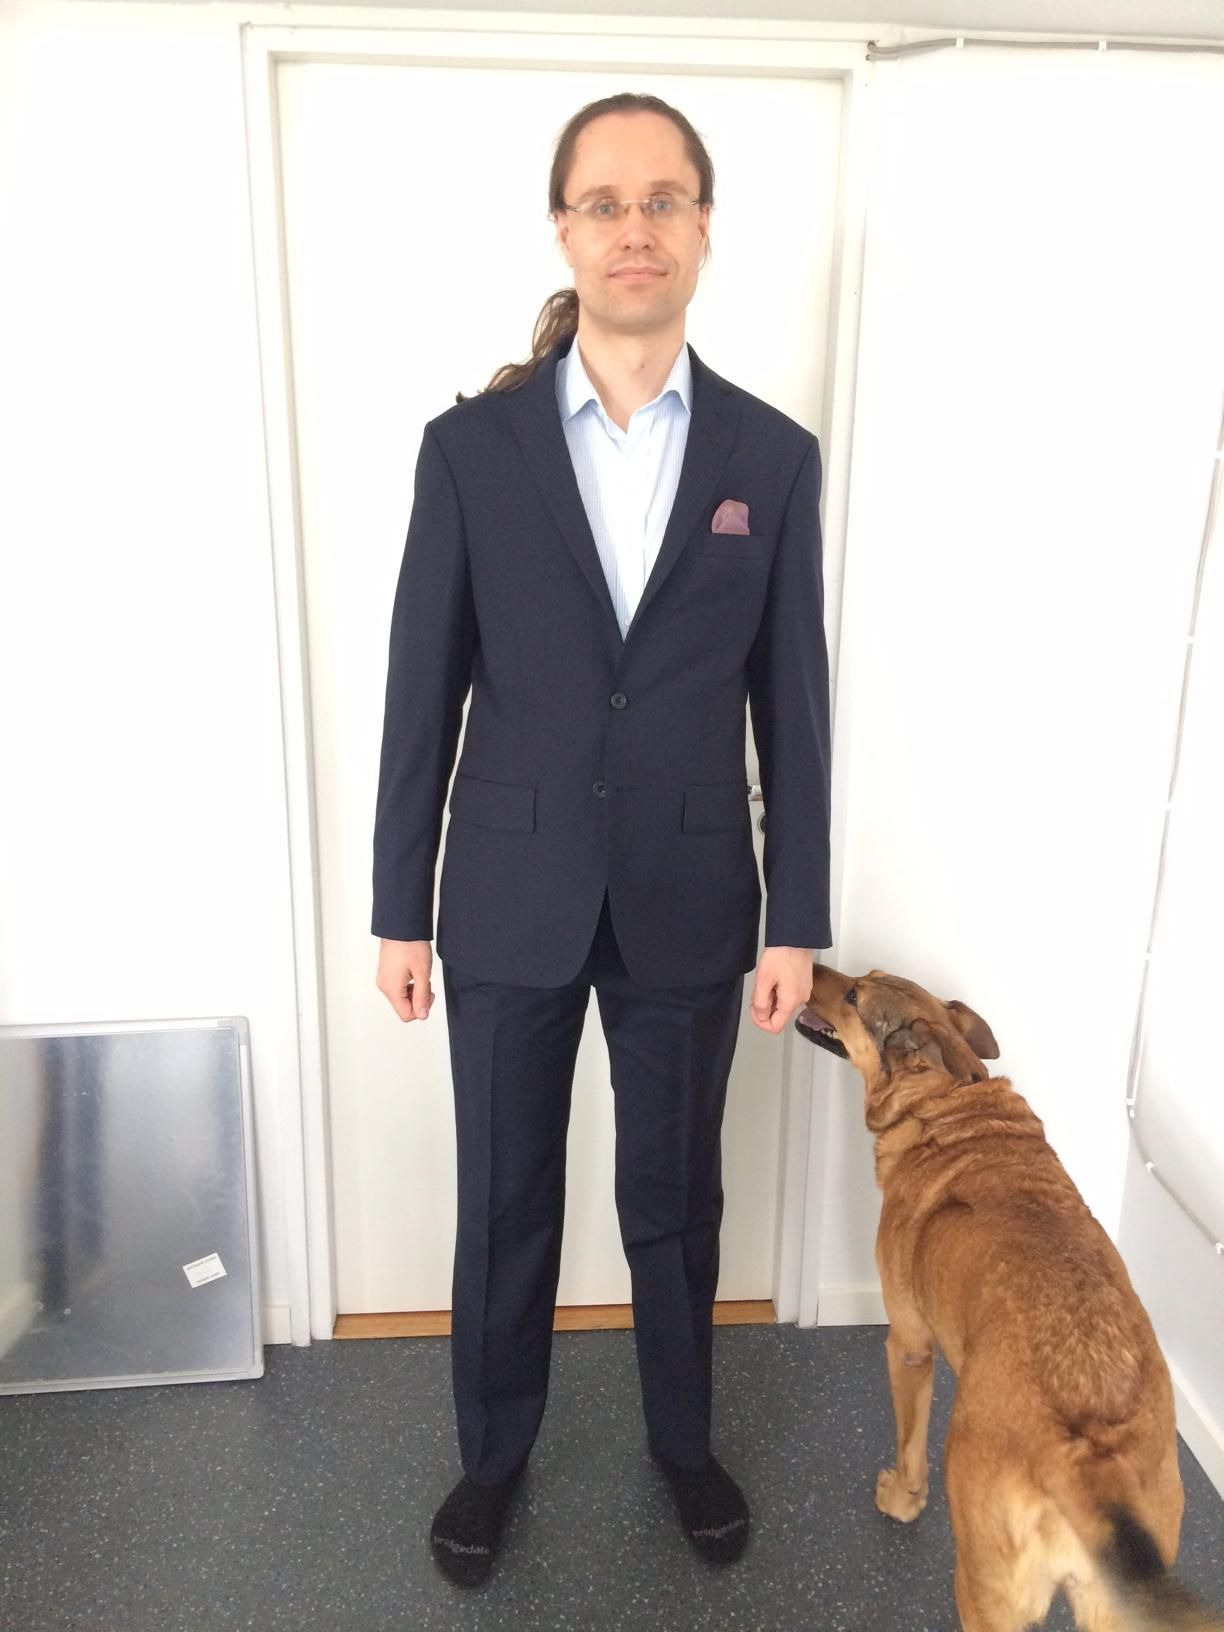 Seems that Tuomas Toivonen dog Senna approves his brand new bespoke